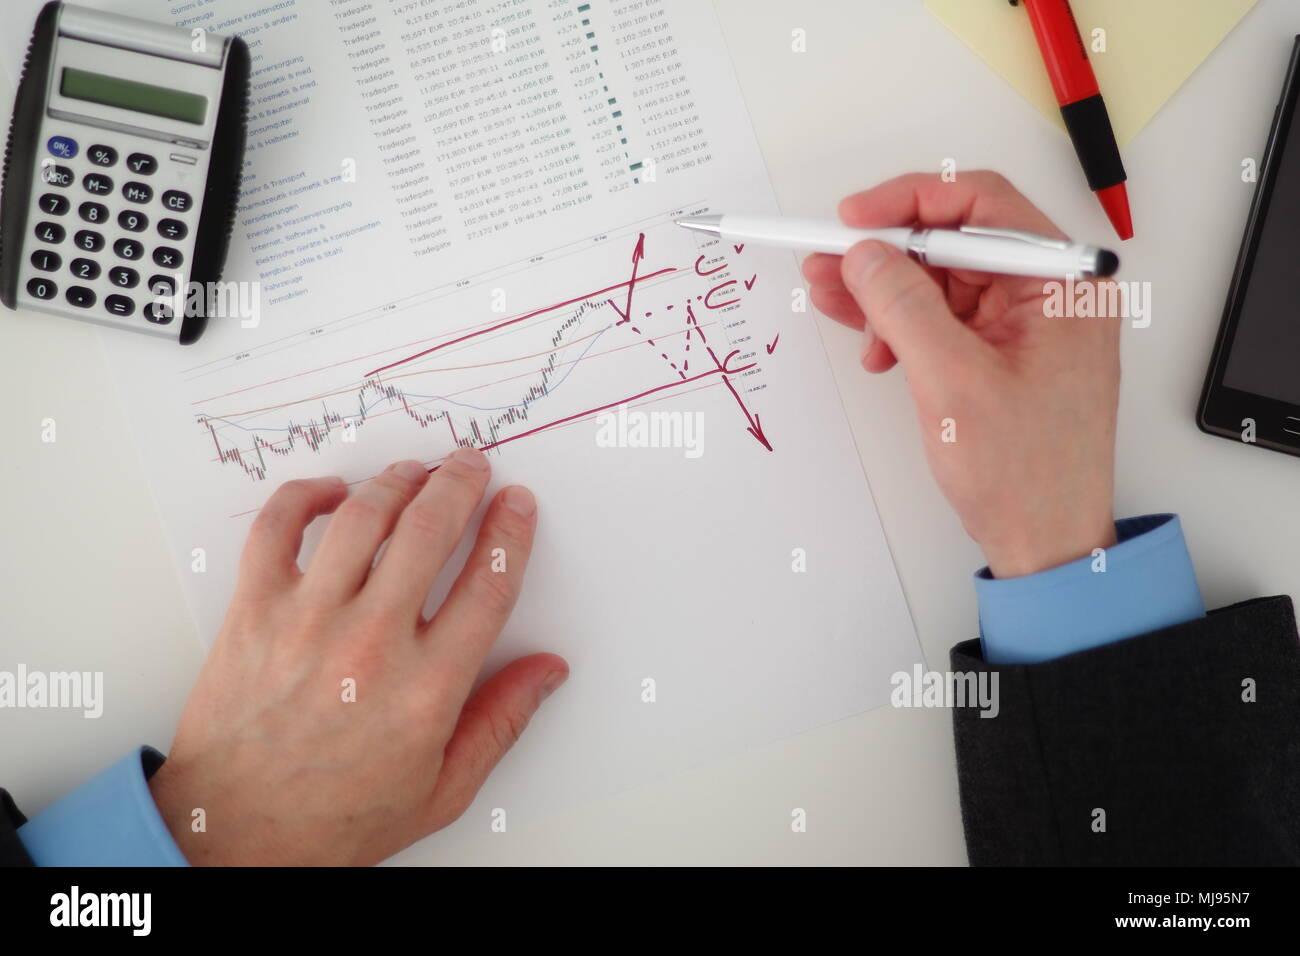 Businessman analyzing stock market - Stock Image